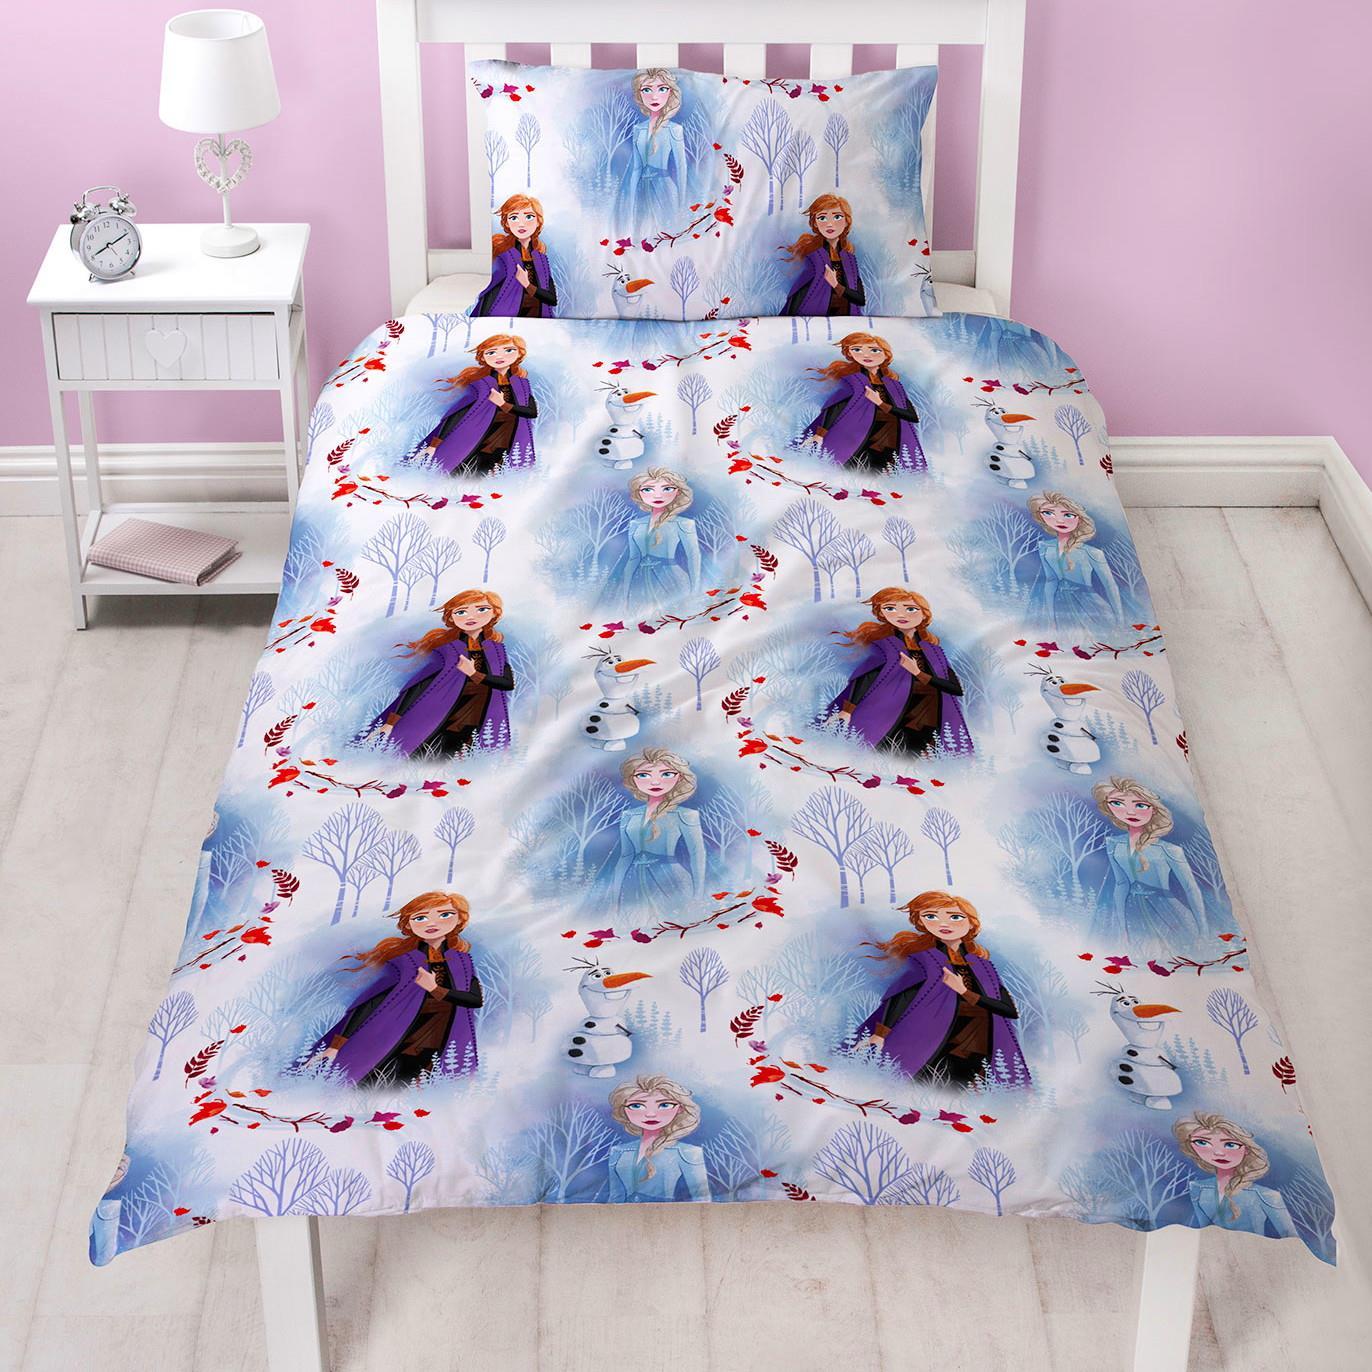 Official-Frozen-2-Duvet-Covers-Single-Double-Reversible-Bedding-Elsa-Anna-Olaf thumbnail 6